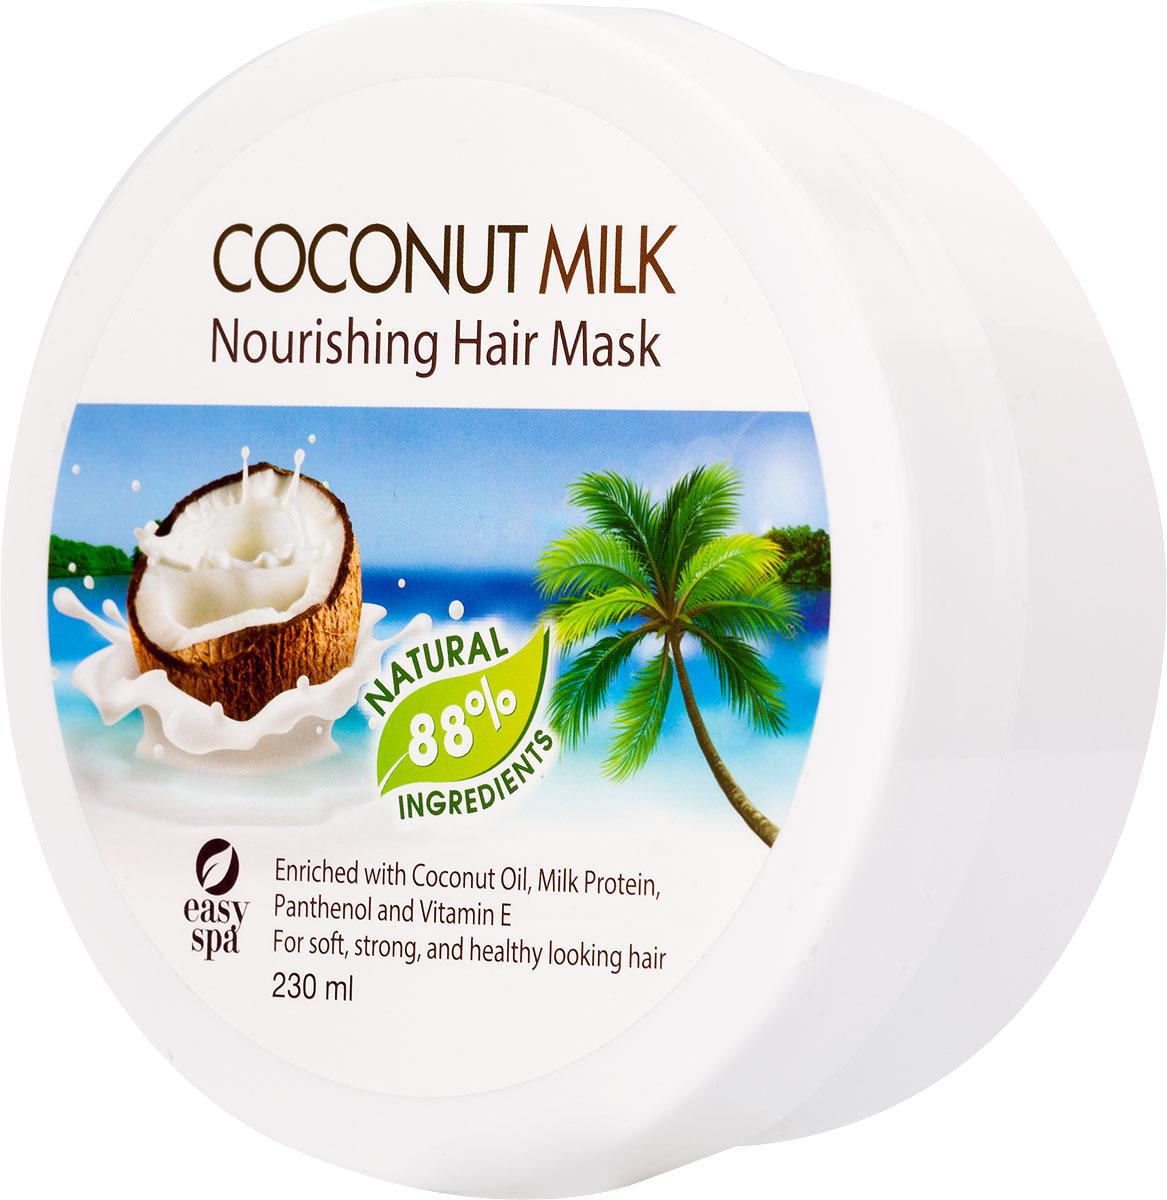 Easy Spa Маска питательная для волос Coconut Milk, 230 мл lx spa pool heater h30 rsi spa heizung 3kw easy to install